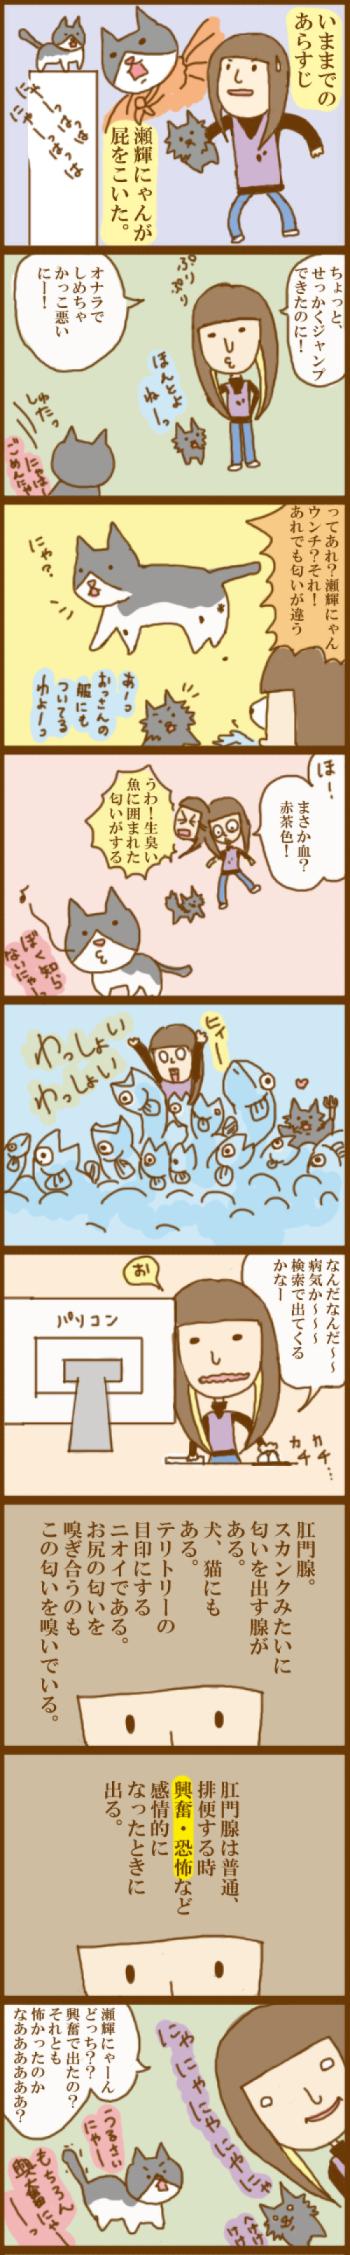 f:id:suzuokayu:20201017211729j:plain